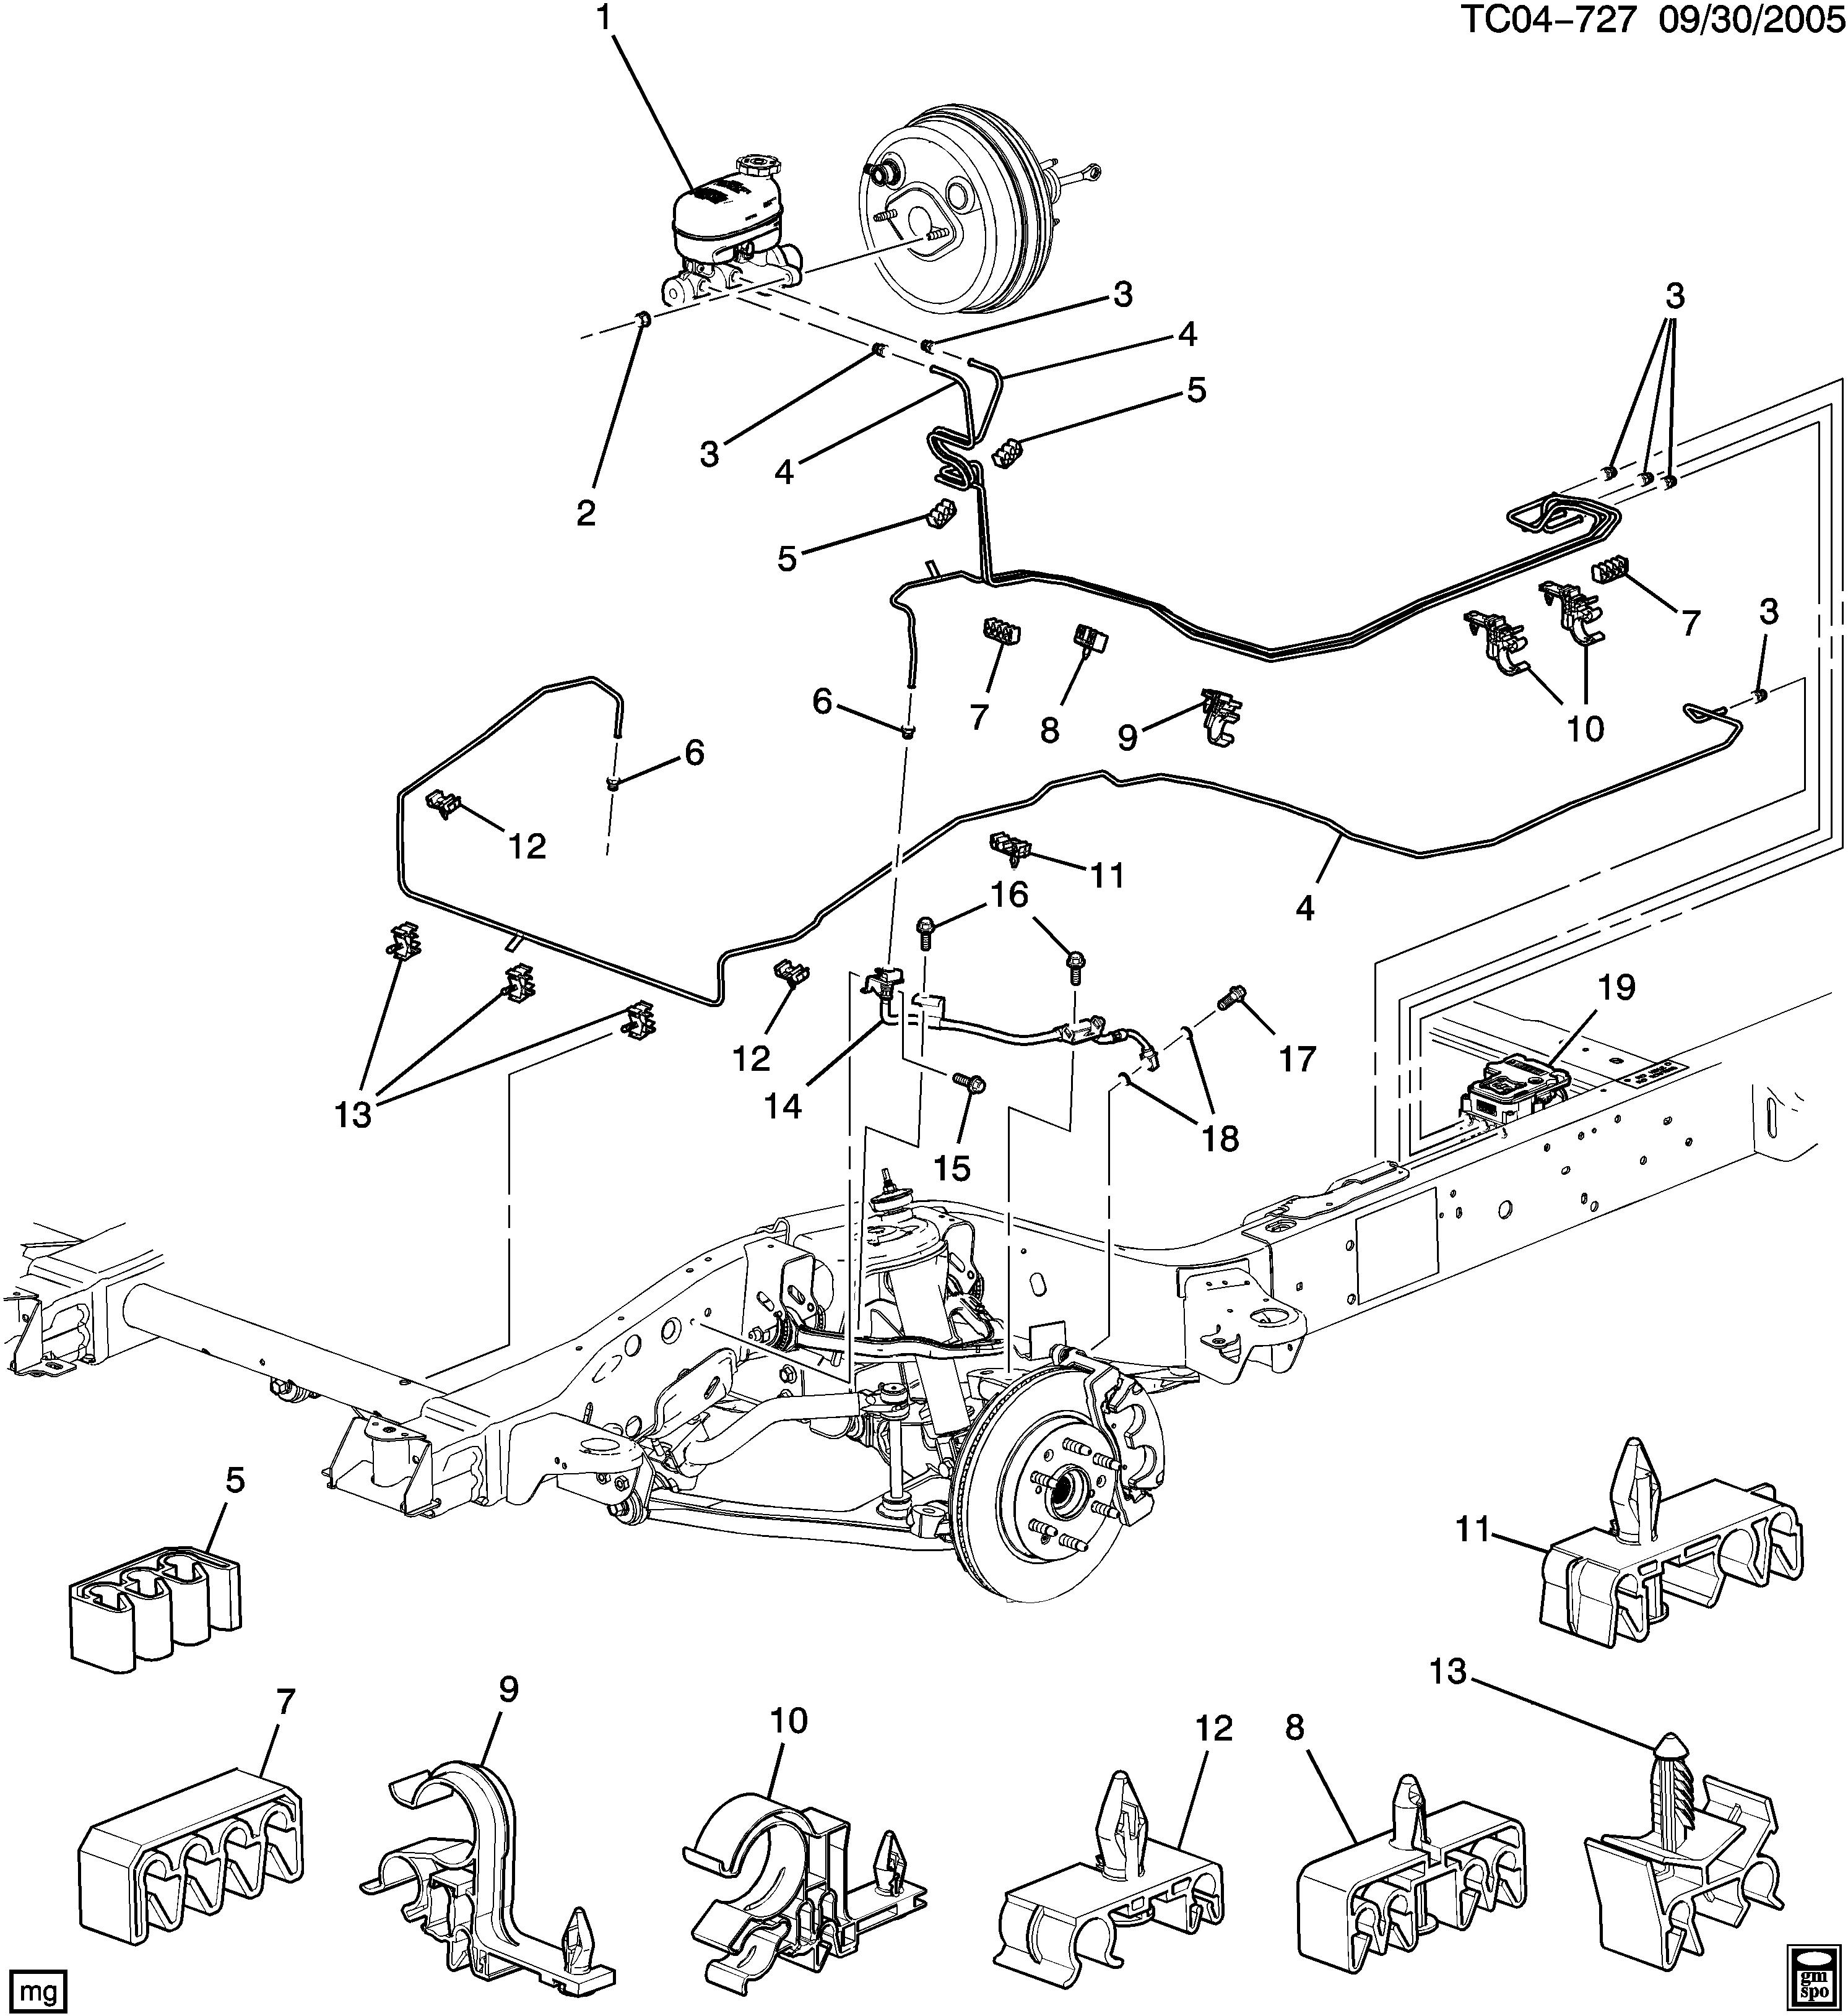 Brake Line Routing Diagram How To Gm Trucks Com